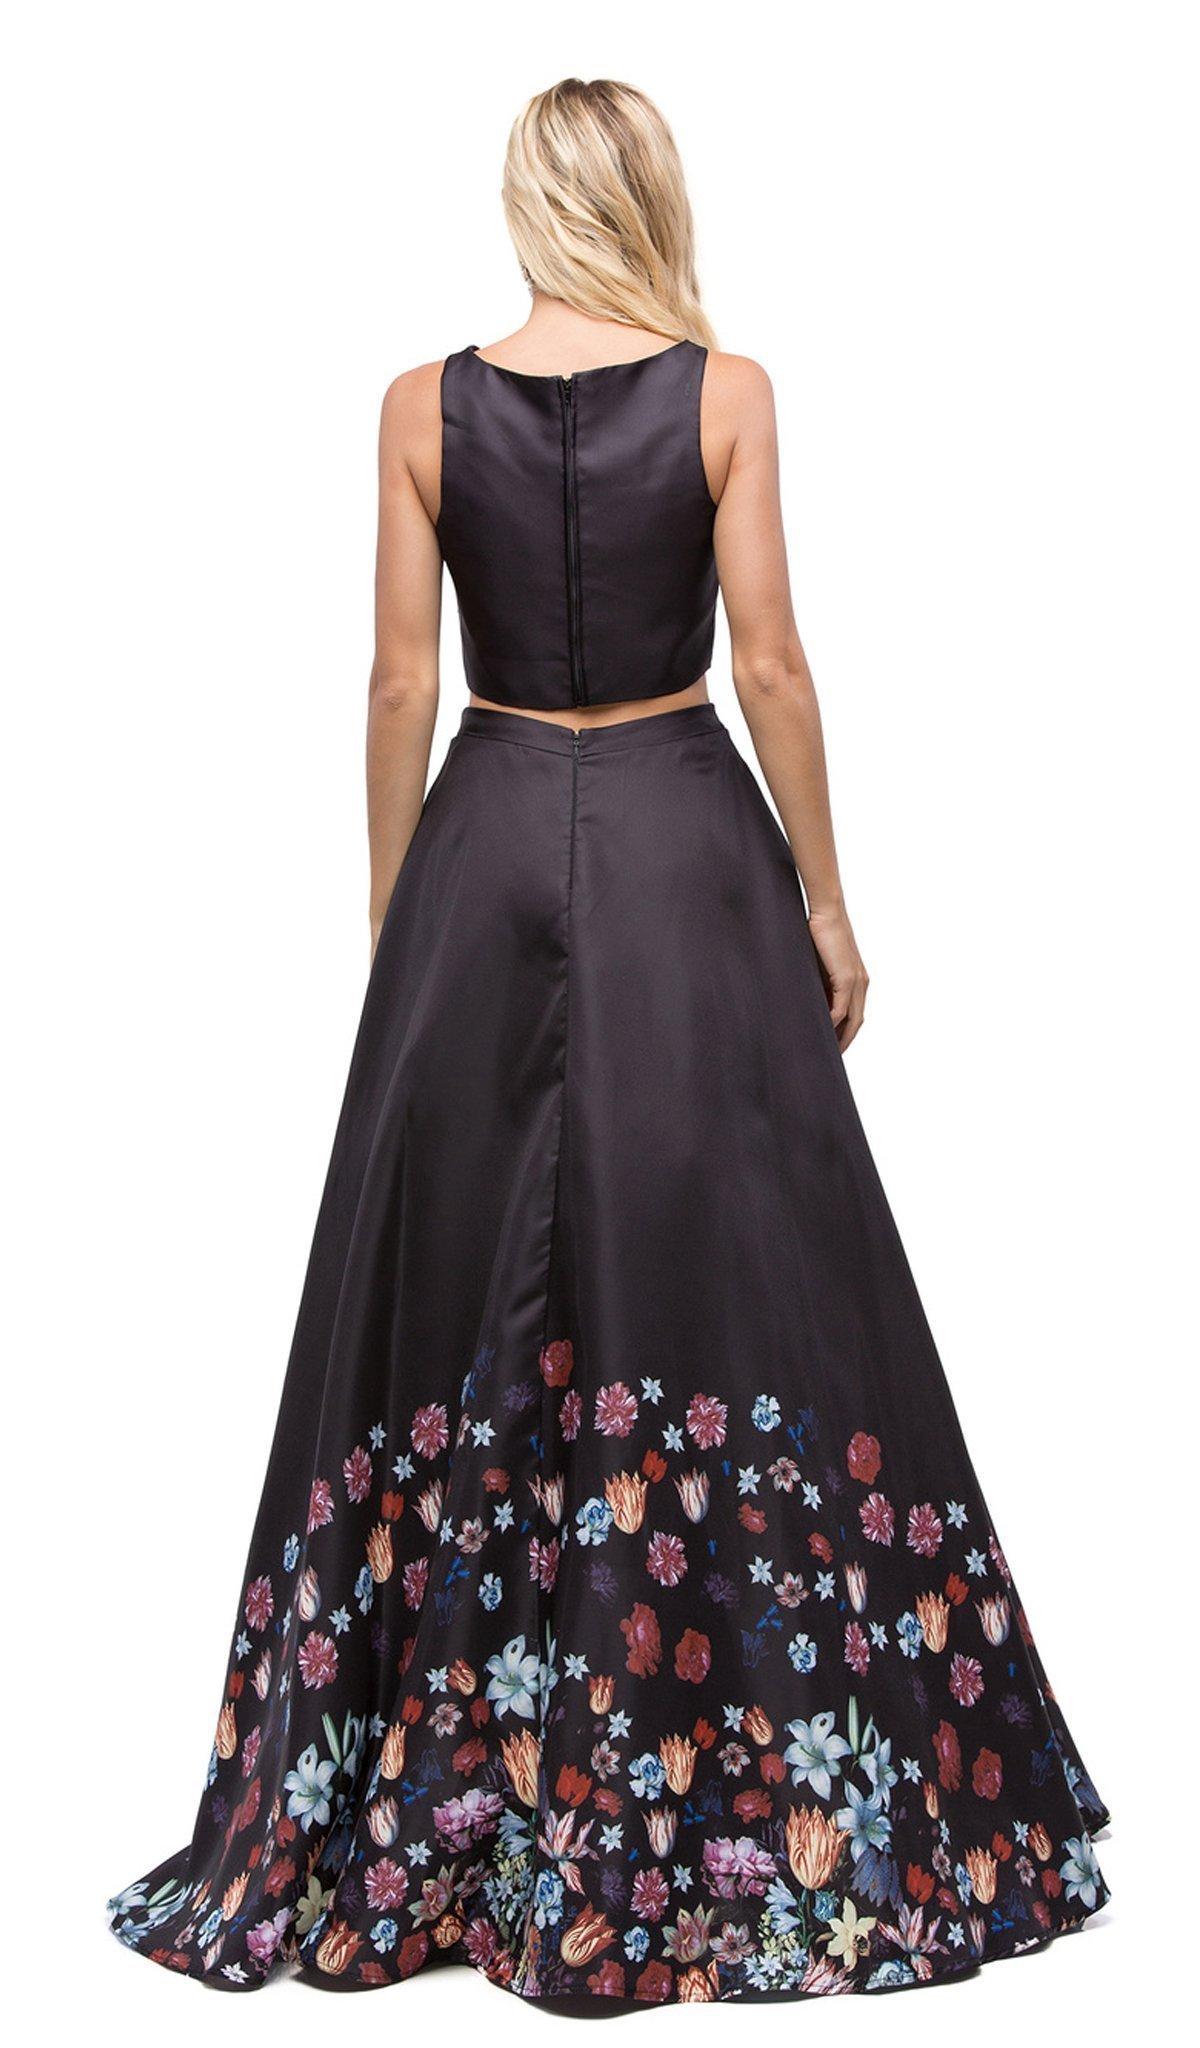 Dancing Queen - 9885 Two-Piece Bateau Floral A-line Prom Dress